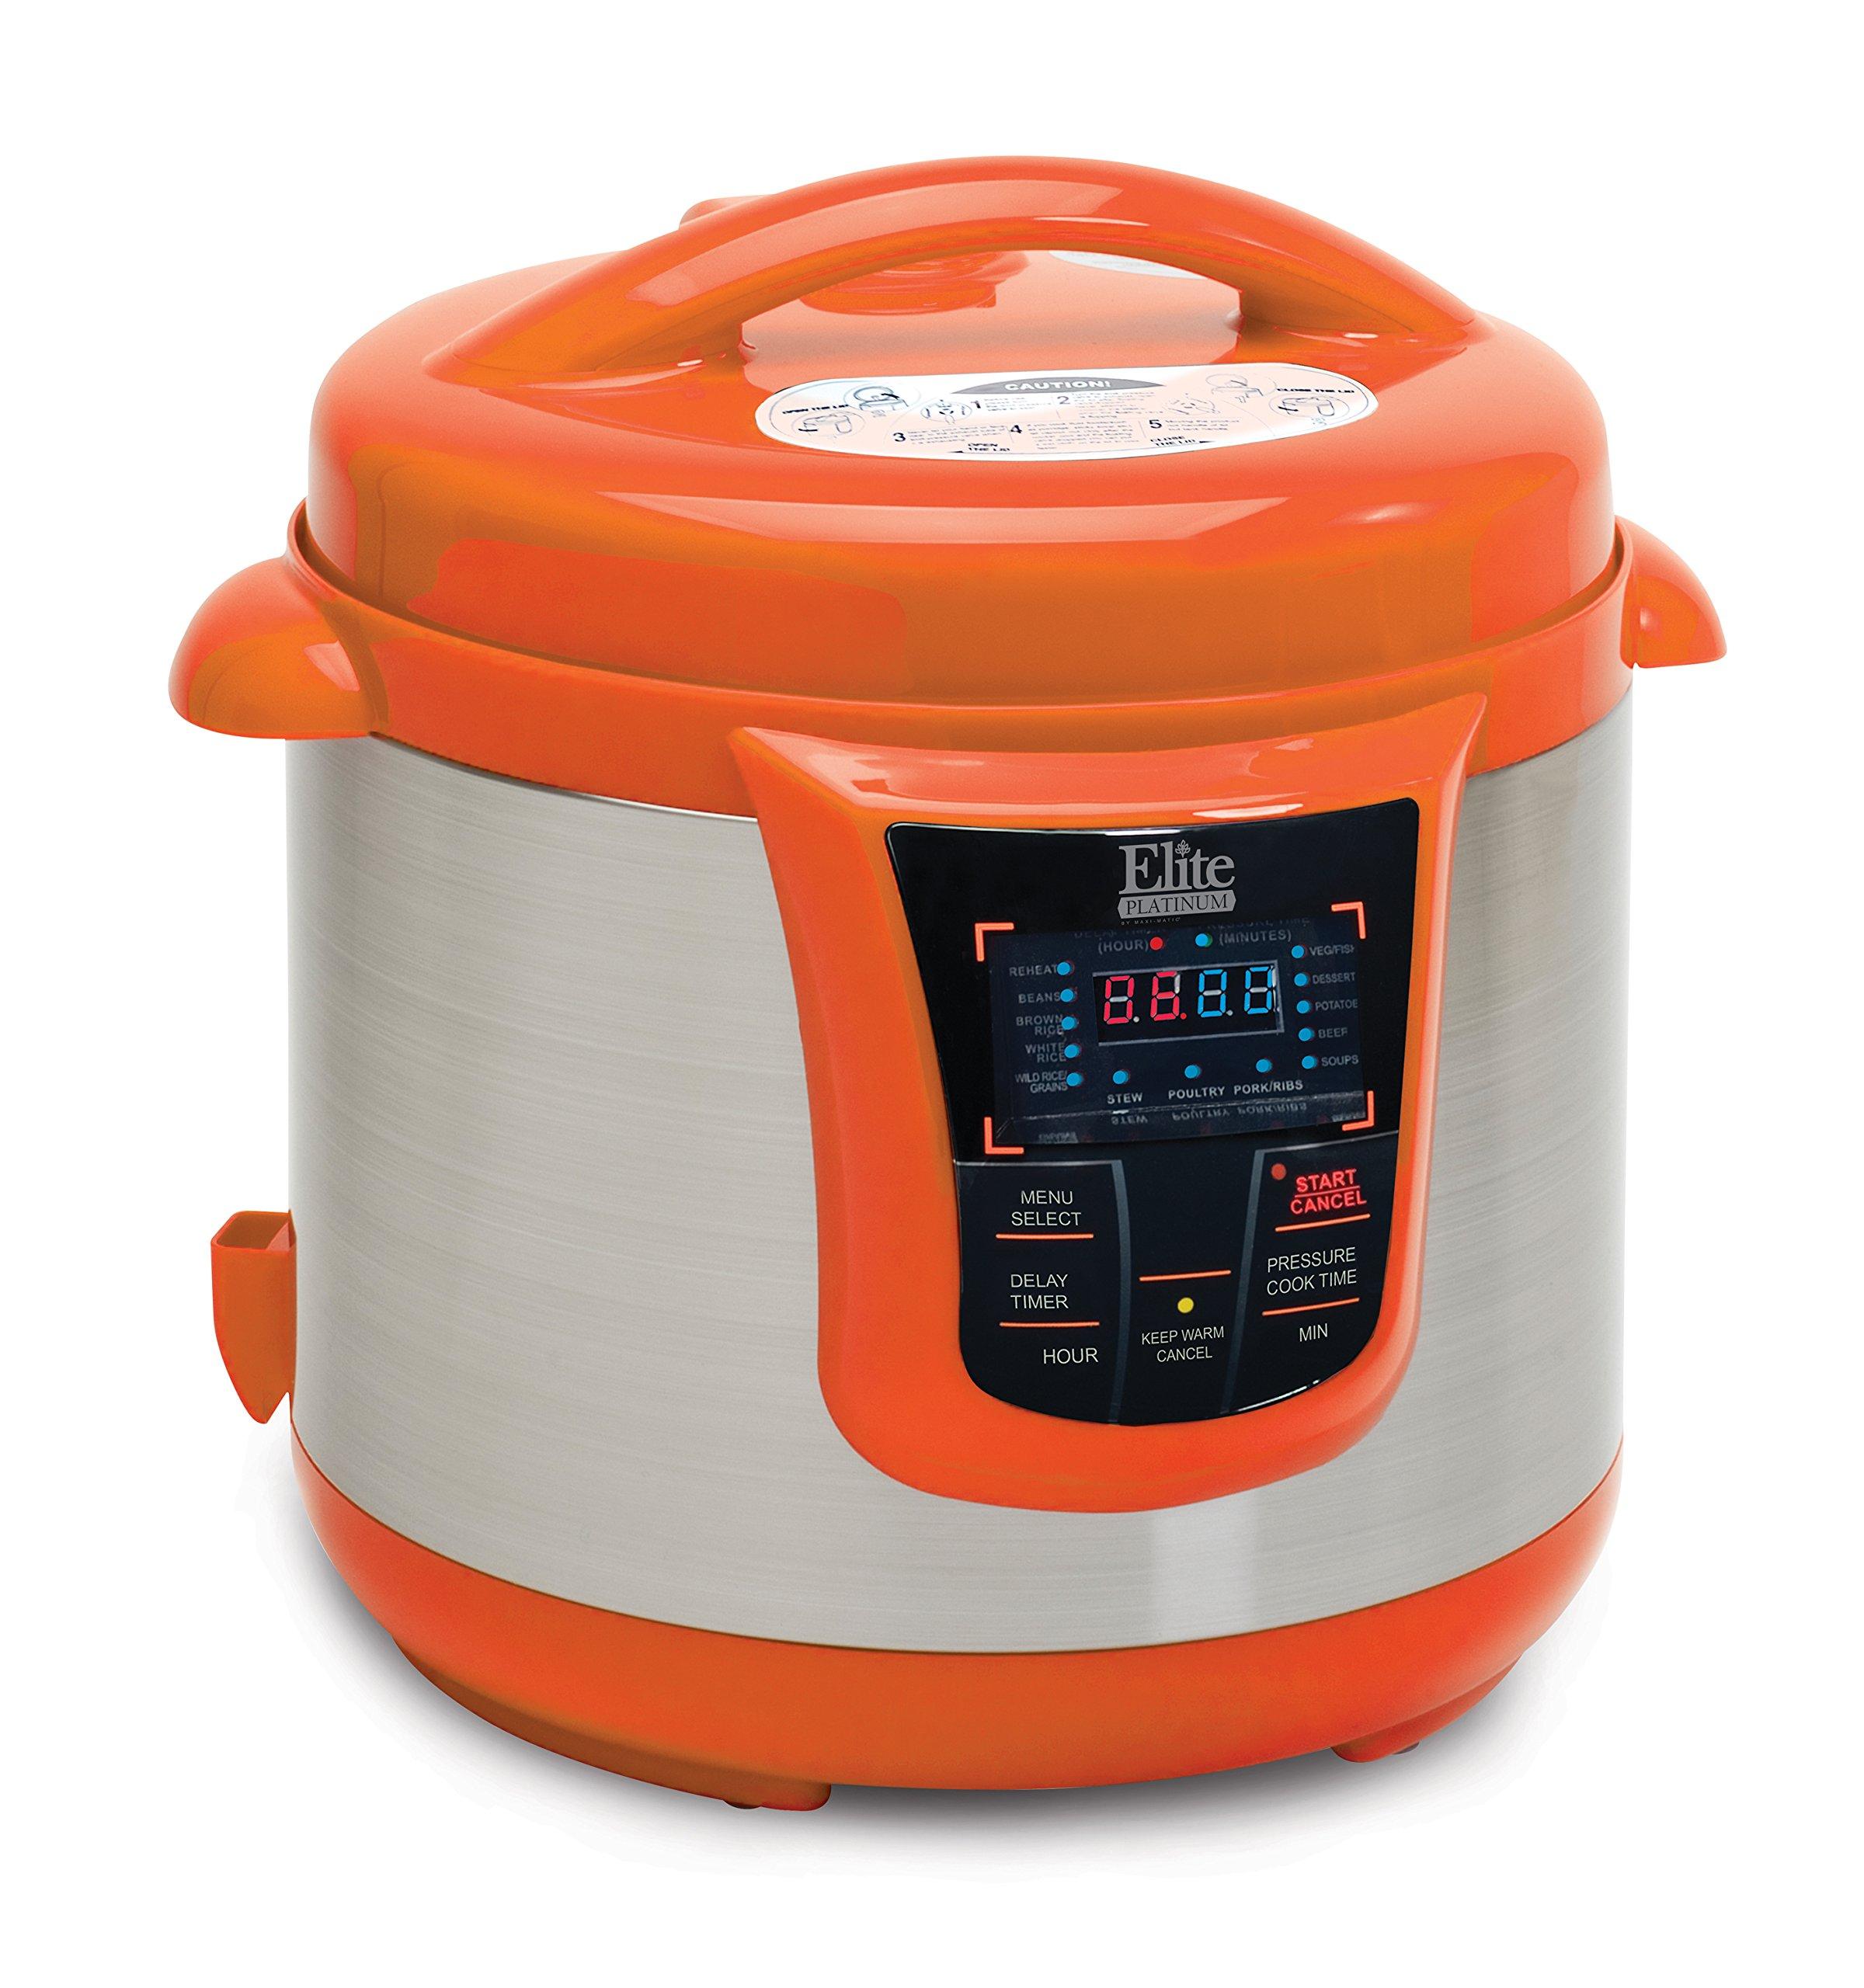 Elite Platinum 8 Quart 14-in-1 Multi-Use Programmable Pressure Cooker, Slow Cooker, Rice Cooker, Sauté, and Warmer - Orange